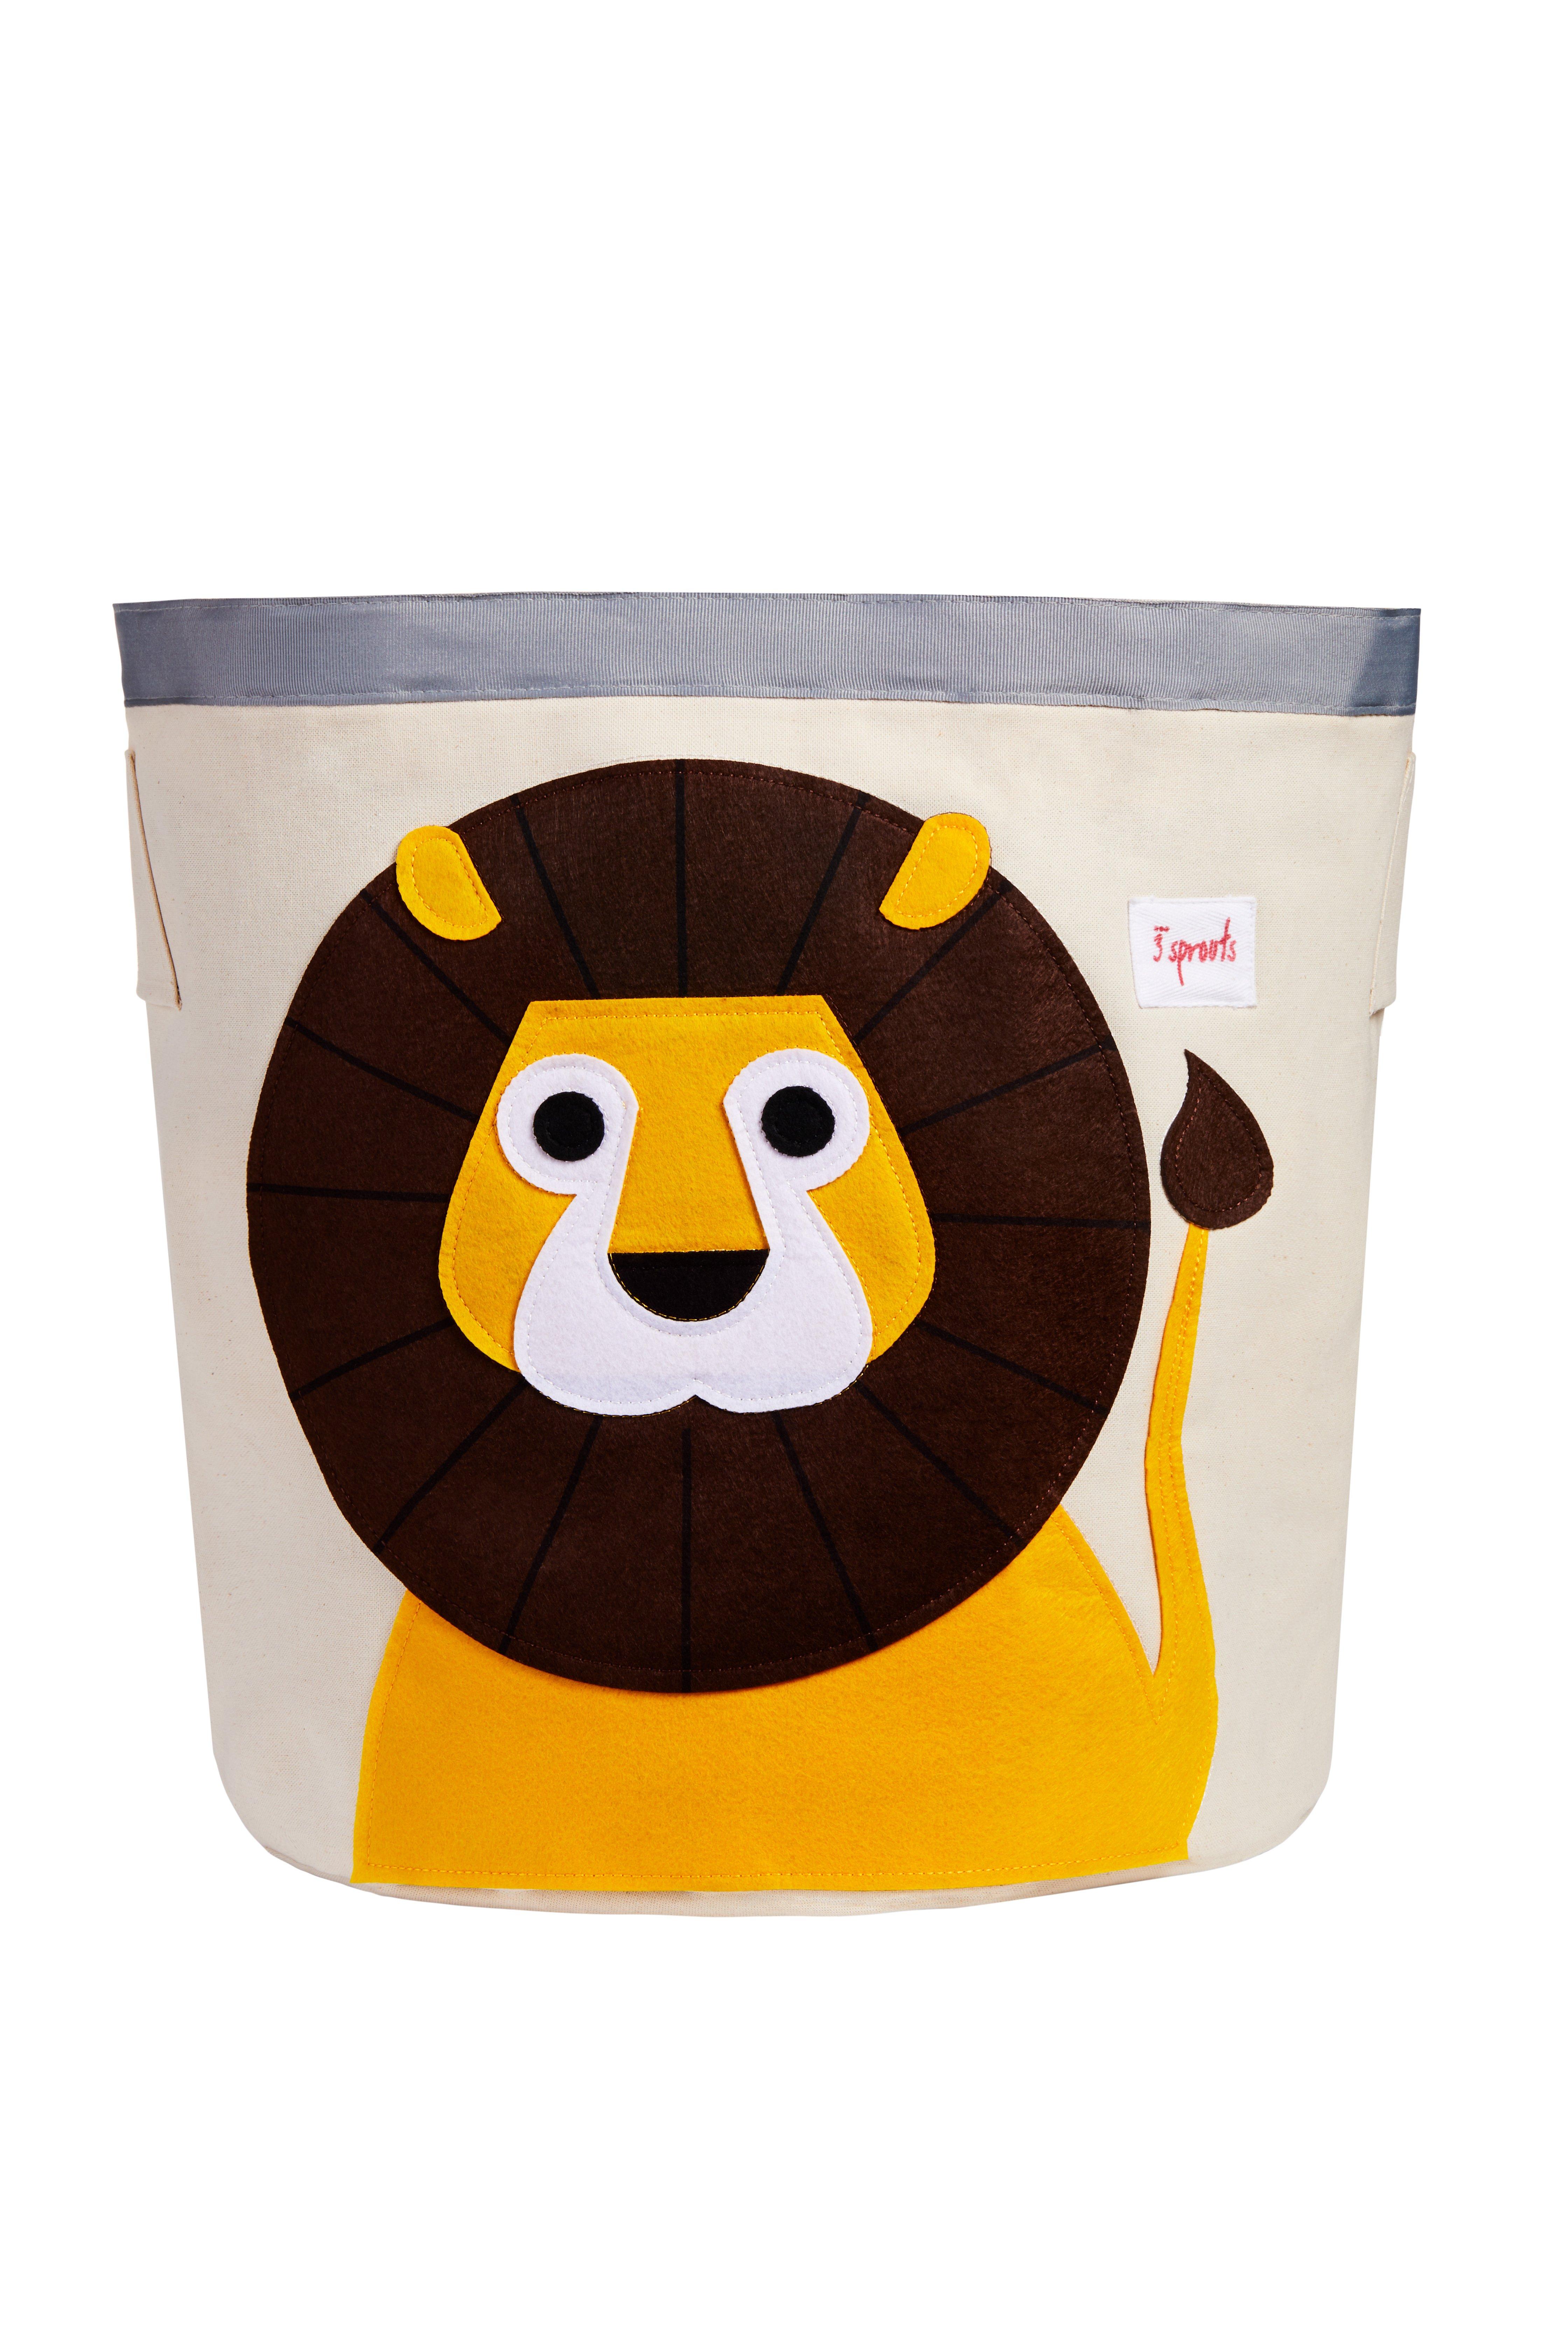 3 Sprouts - Storage Bin - Yellow Lion